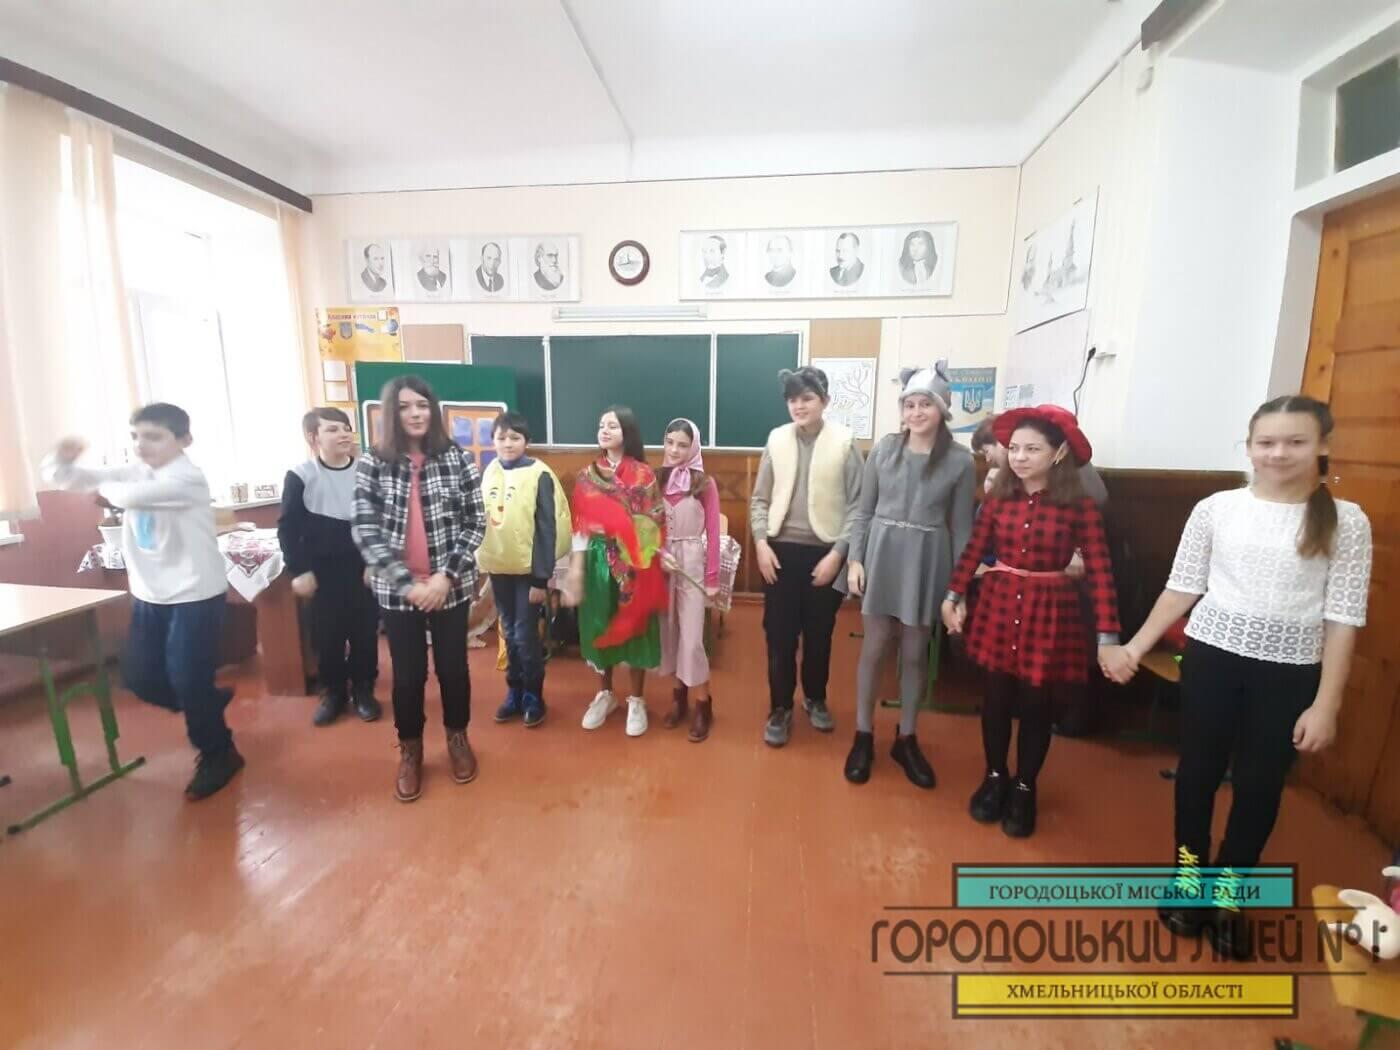 zobrazhennya viber 2020 12 28 21 43 02 1400x1050 - Театральний гурток «Сяйво»